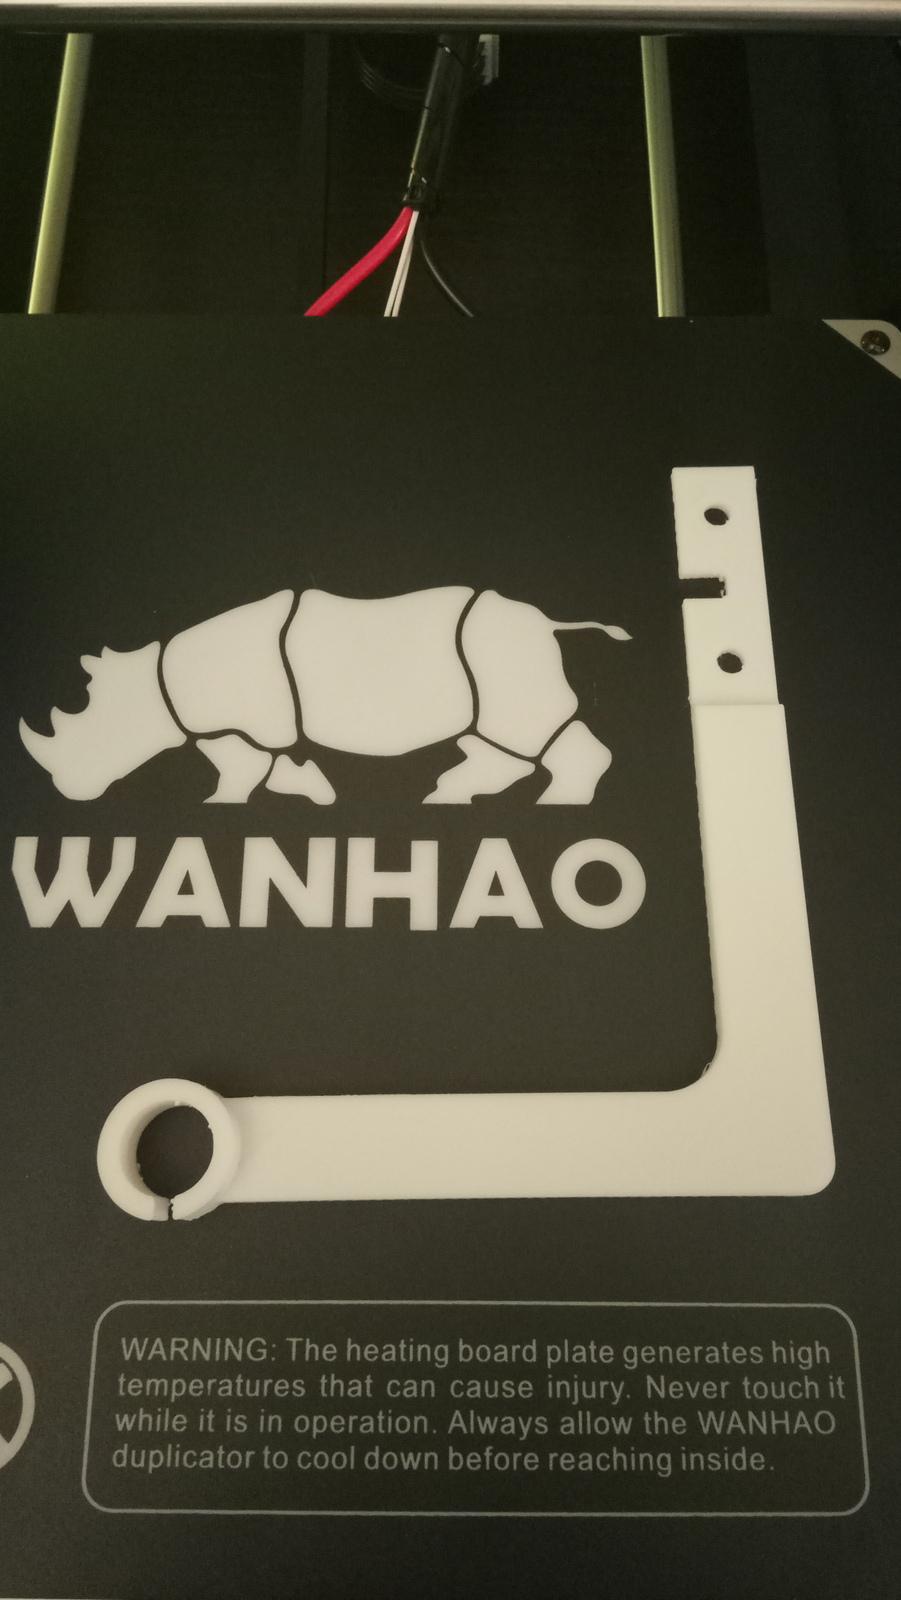 Wanhao 3d 2.1 Print filament guide